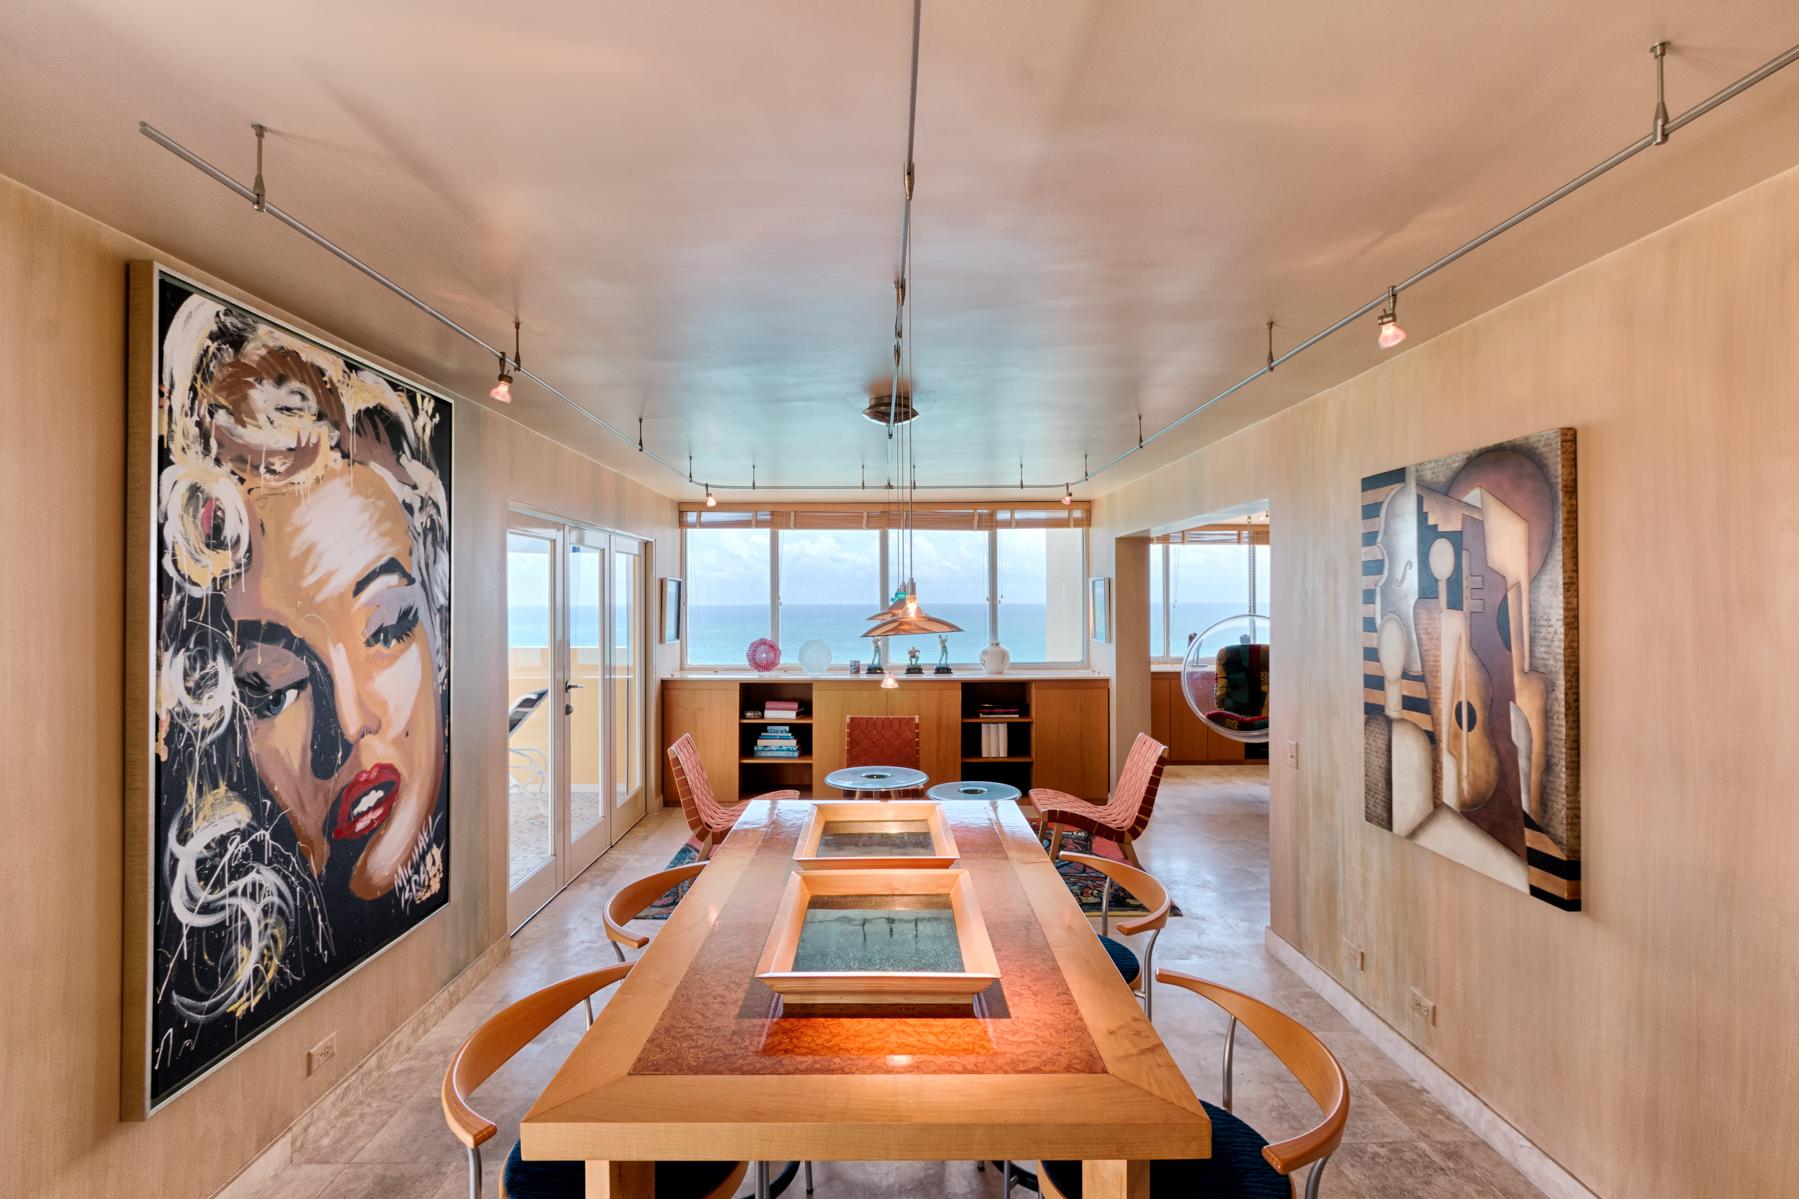 Duplex for Sale at The Ultimate Beach Penthouse 6165 Isla Verde Ave. PH Carolina, Puerto Rico 00979 Puerto Rico